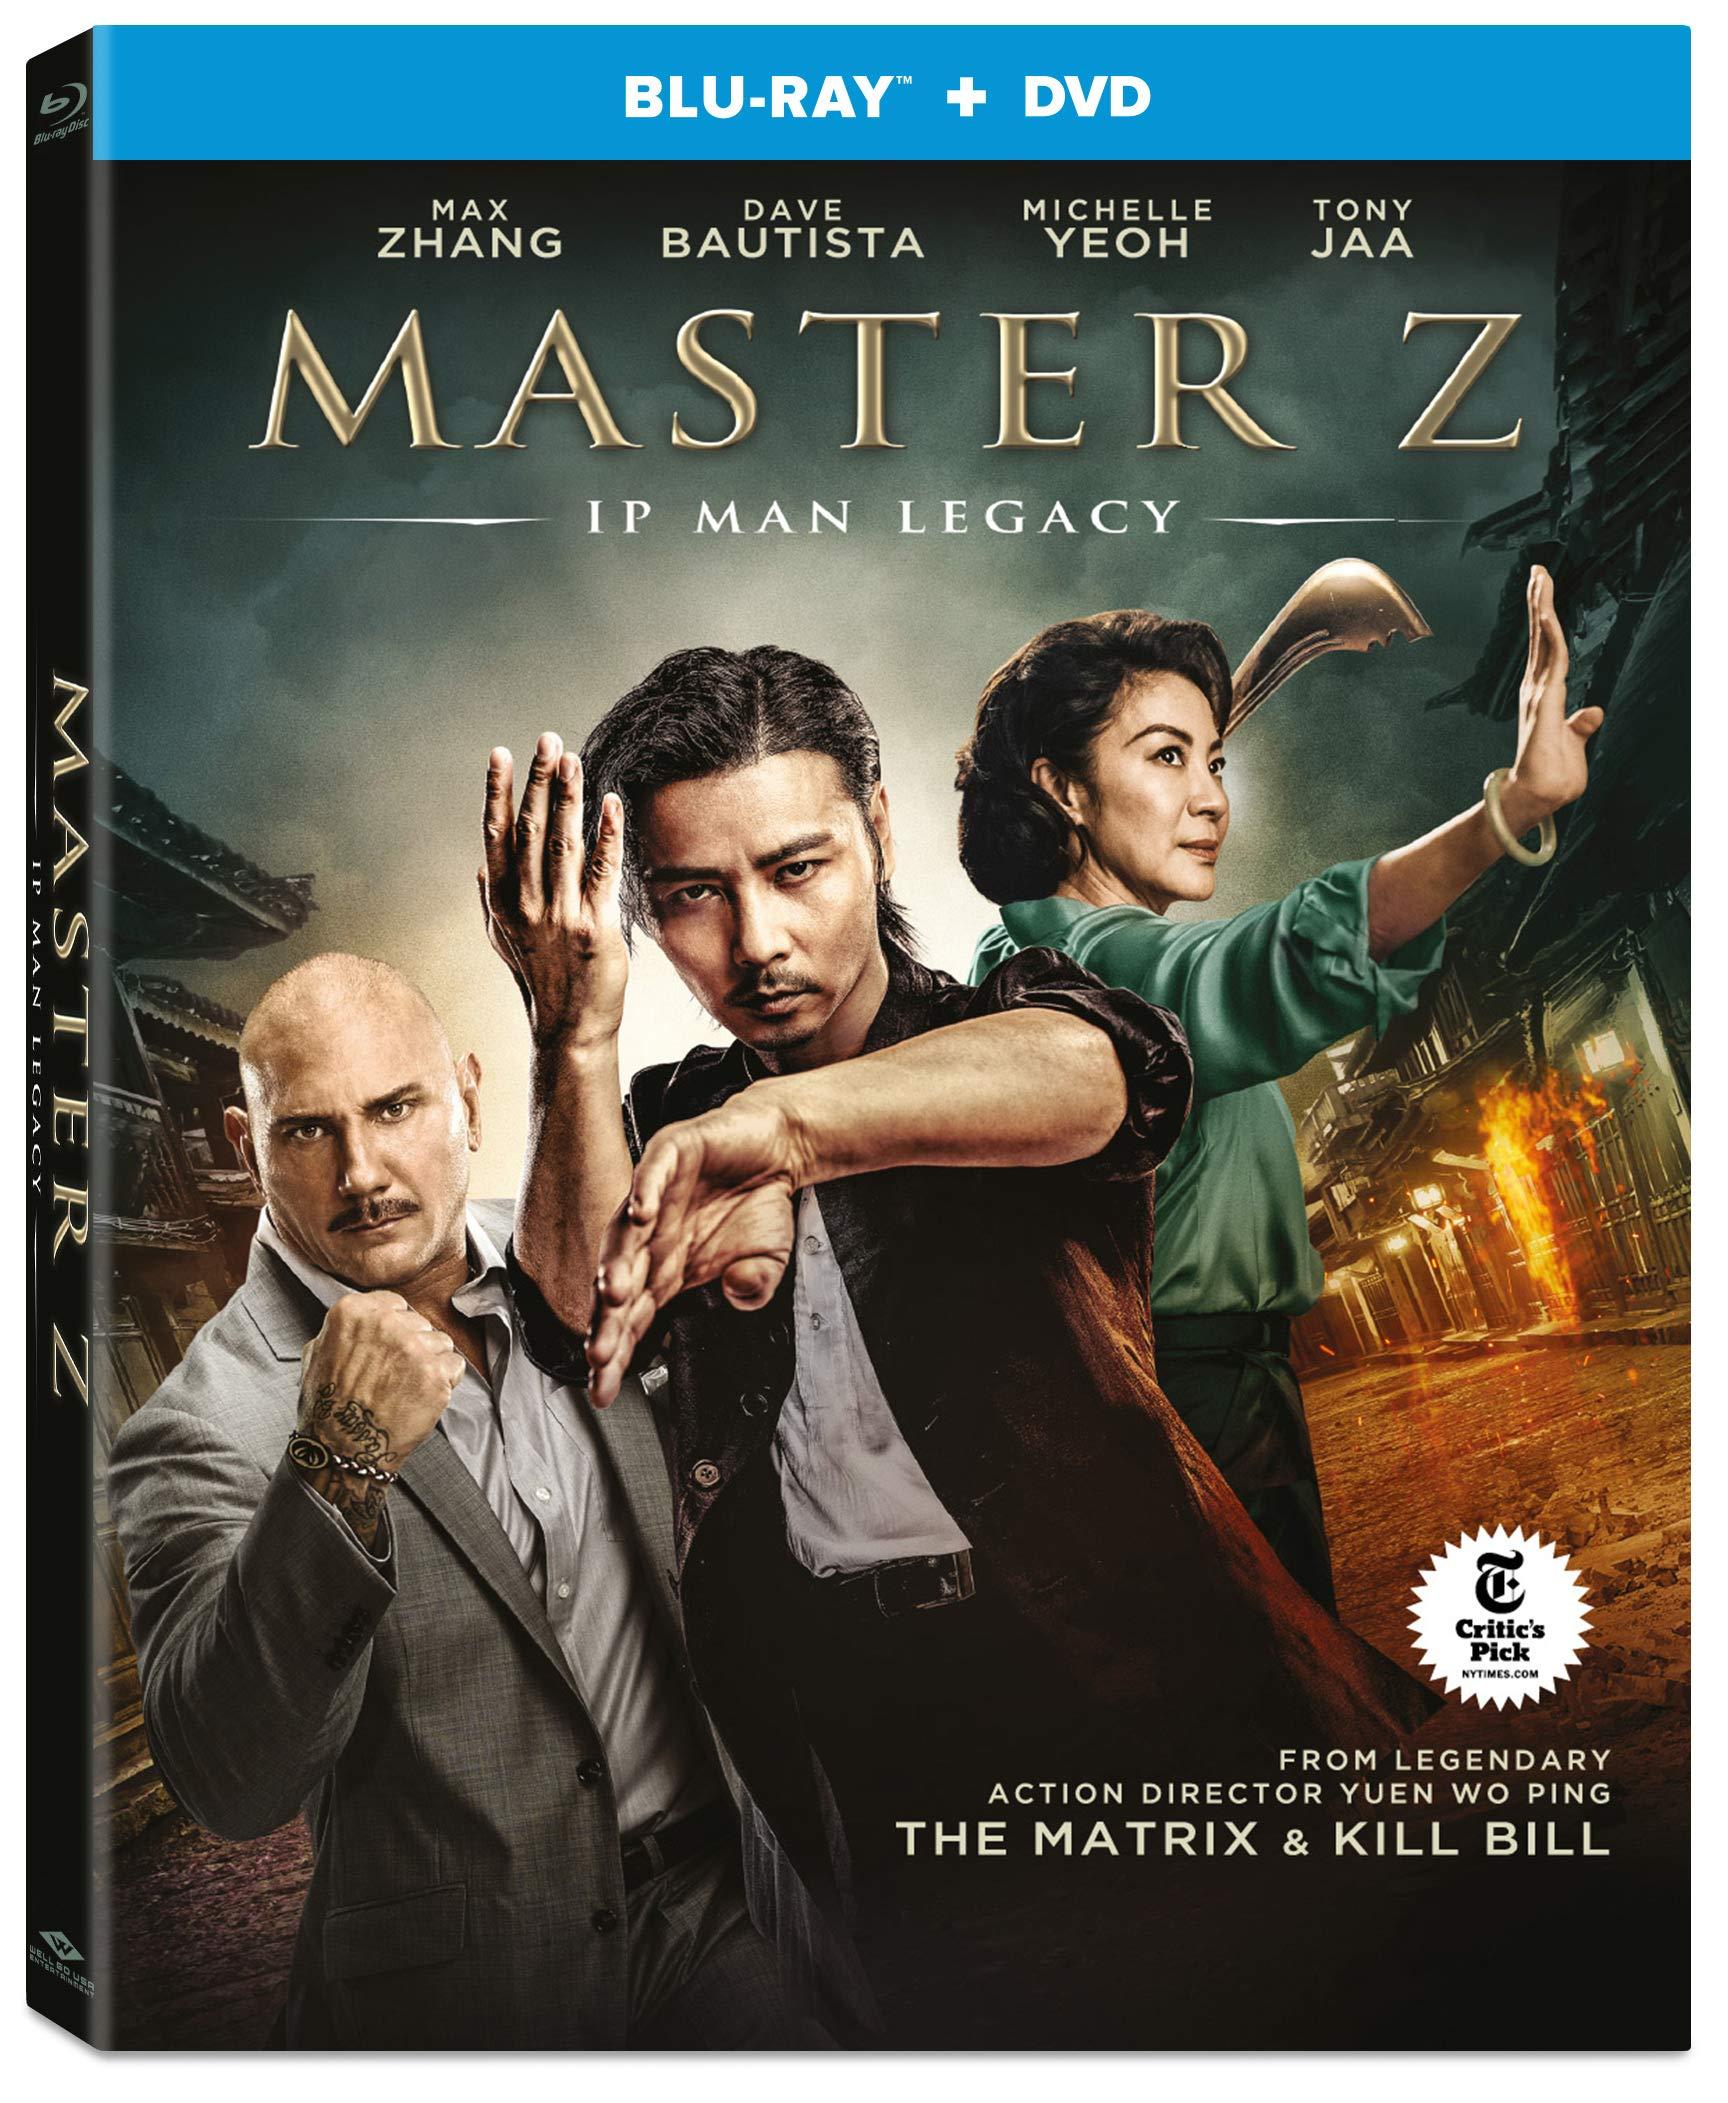 Master Z: Ip Man Legacy [Blu-ray+DVD]: Michelle ... - Amazon.com